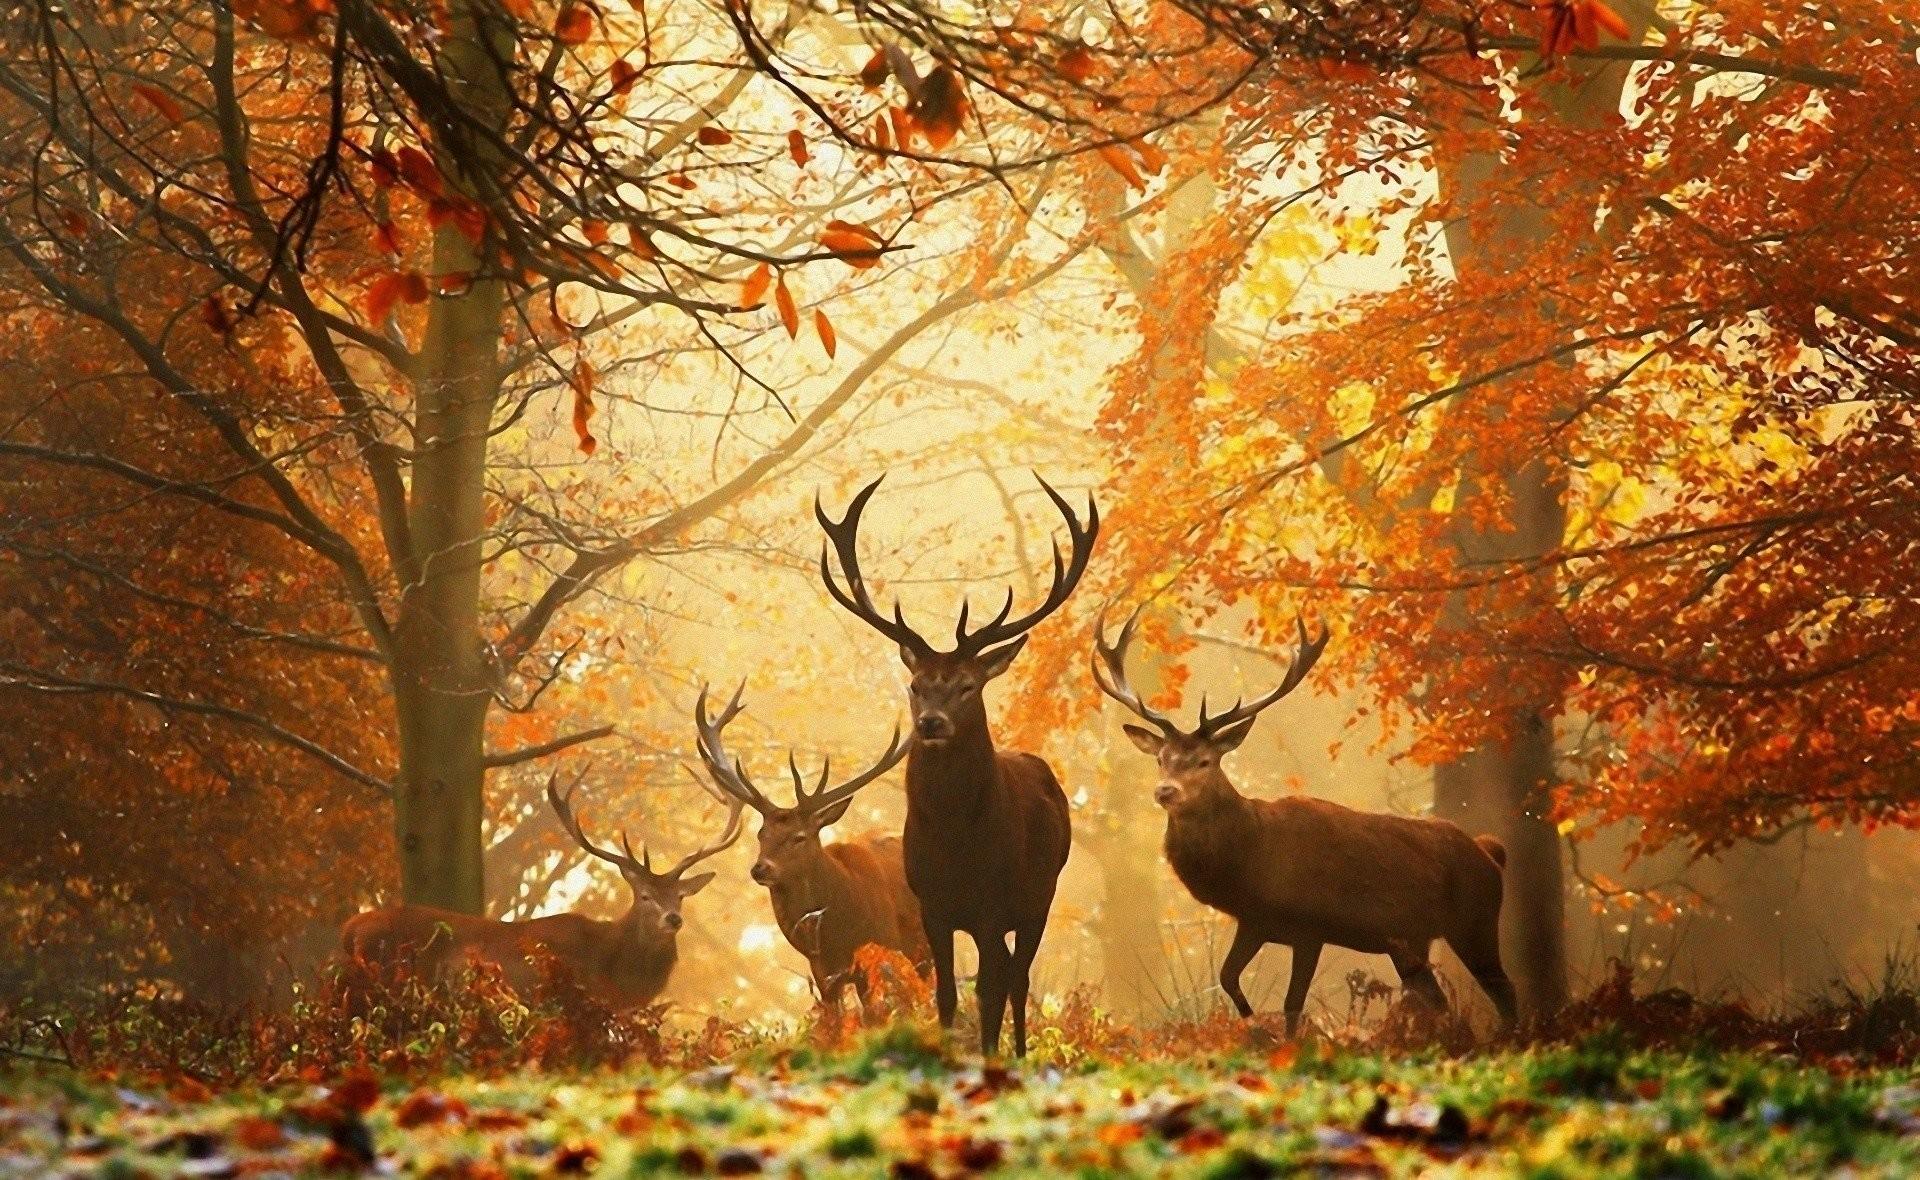 Deer Hunting Wallpaper for Computer (57+ images)